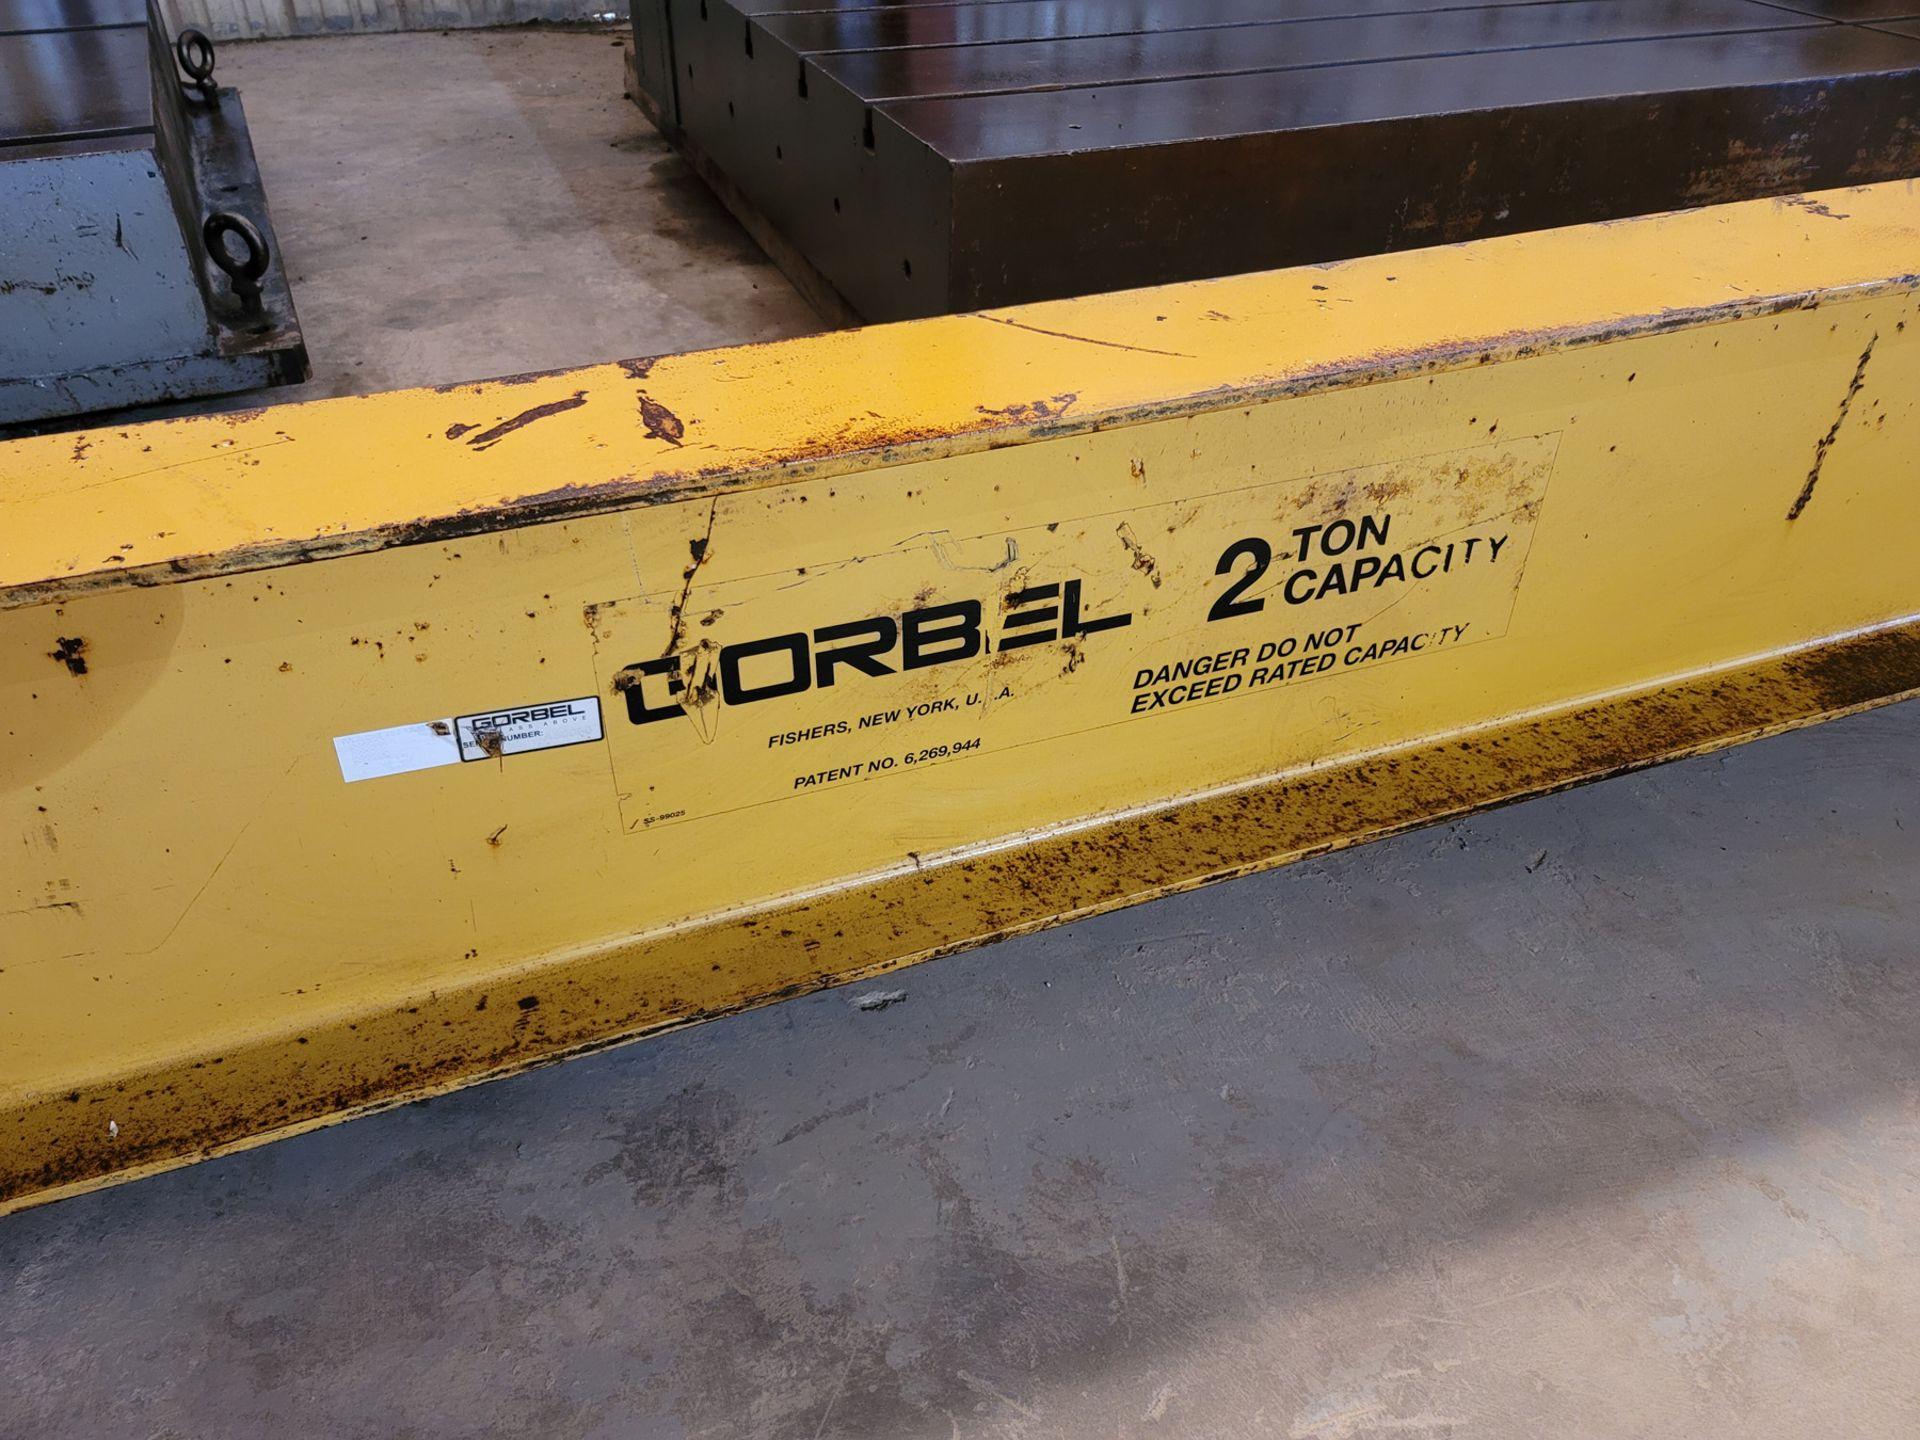 Gorbel 2 Ton Jib Crane with 2 Ton Lodestar CM Hoist - Image 3 of 7